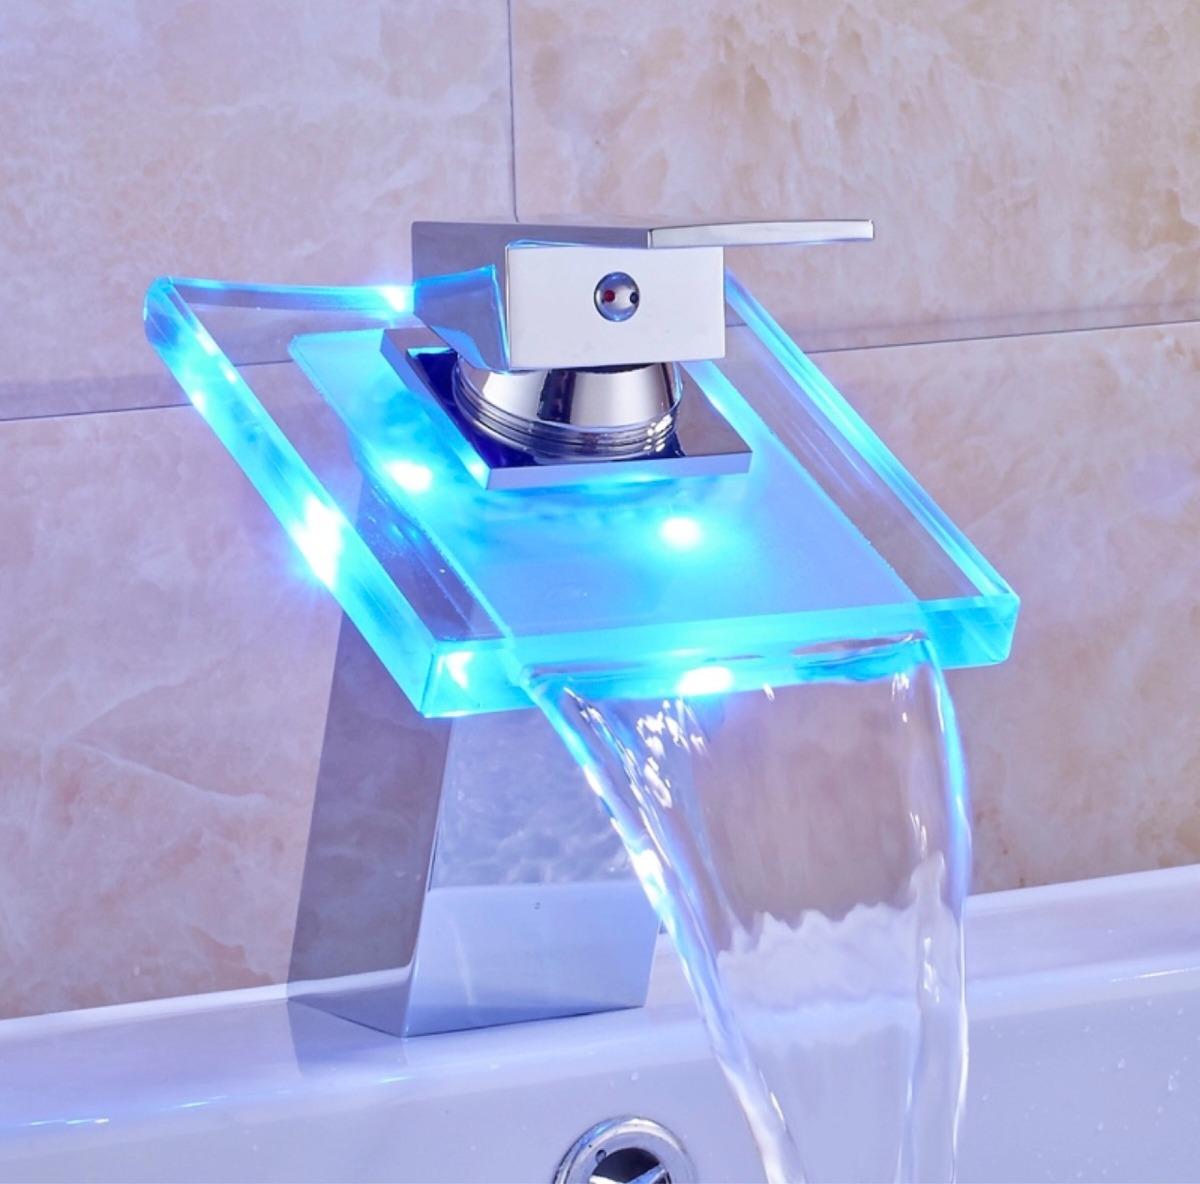 Llave mezcladora monomando led lavabo cristal r0 137 for Repuesto llave monomando